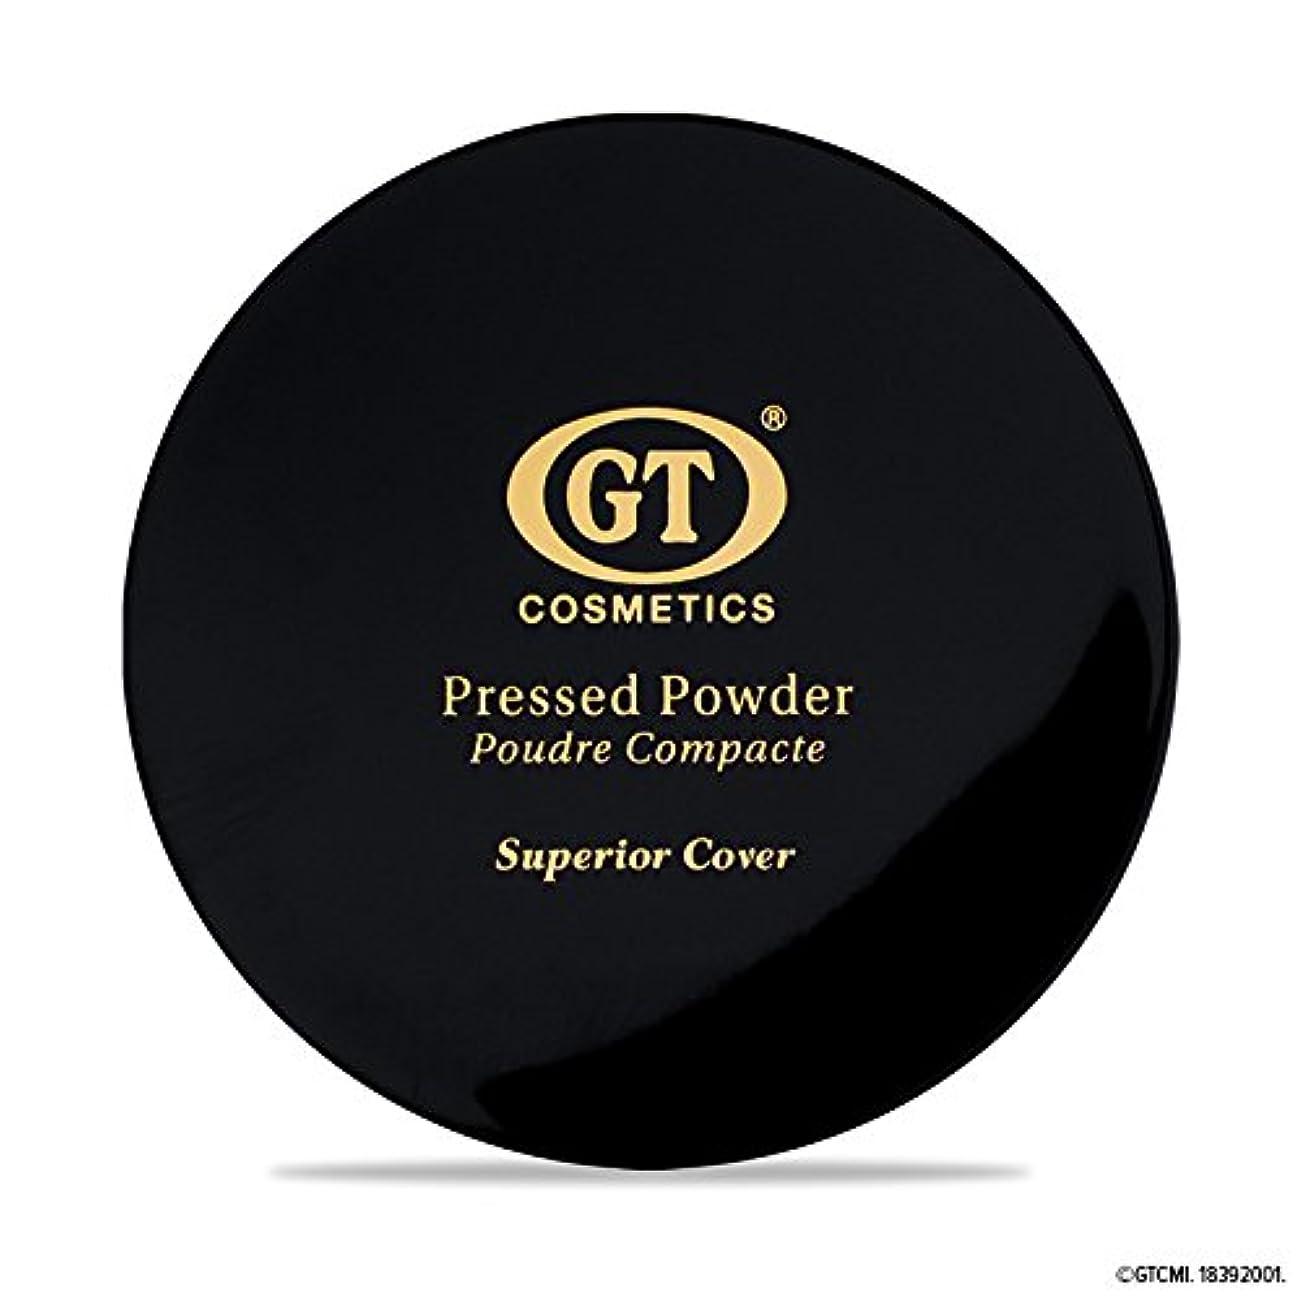 GTpressed powder ライトベージュ SPF20 正規輸入代理店 日本初上陸 コスメティック オーガニック ファンデーション